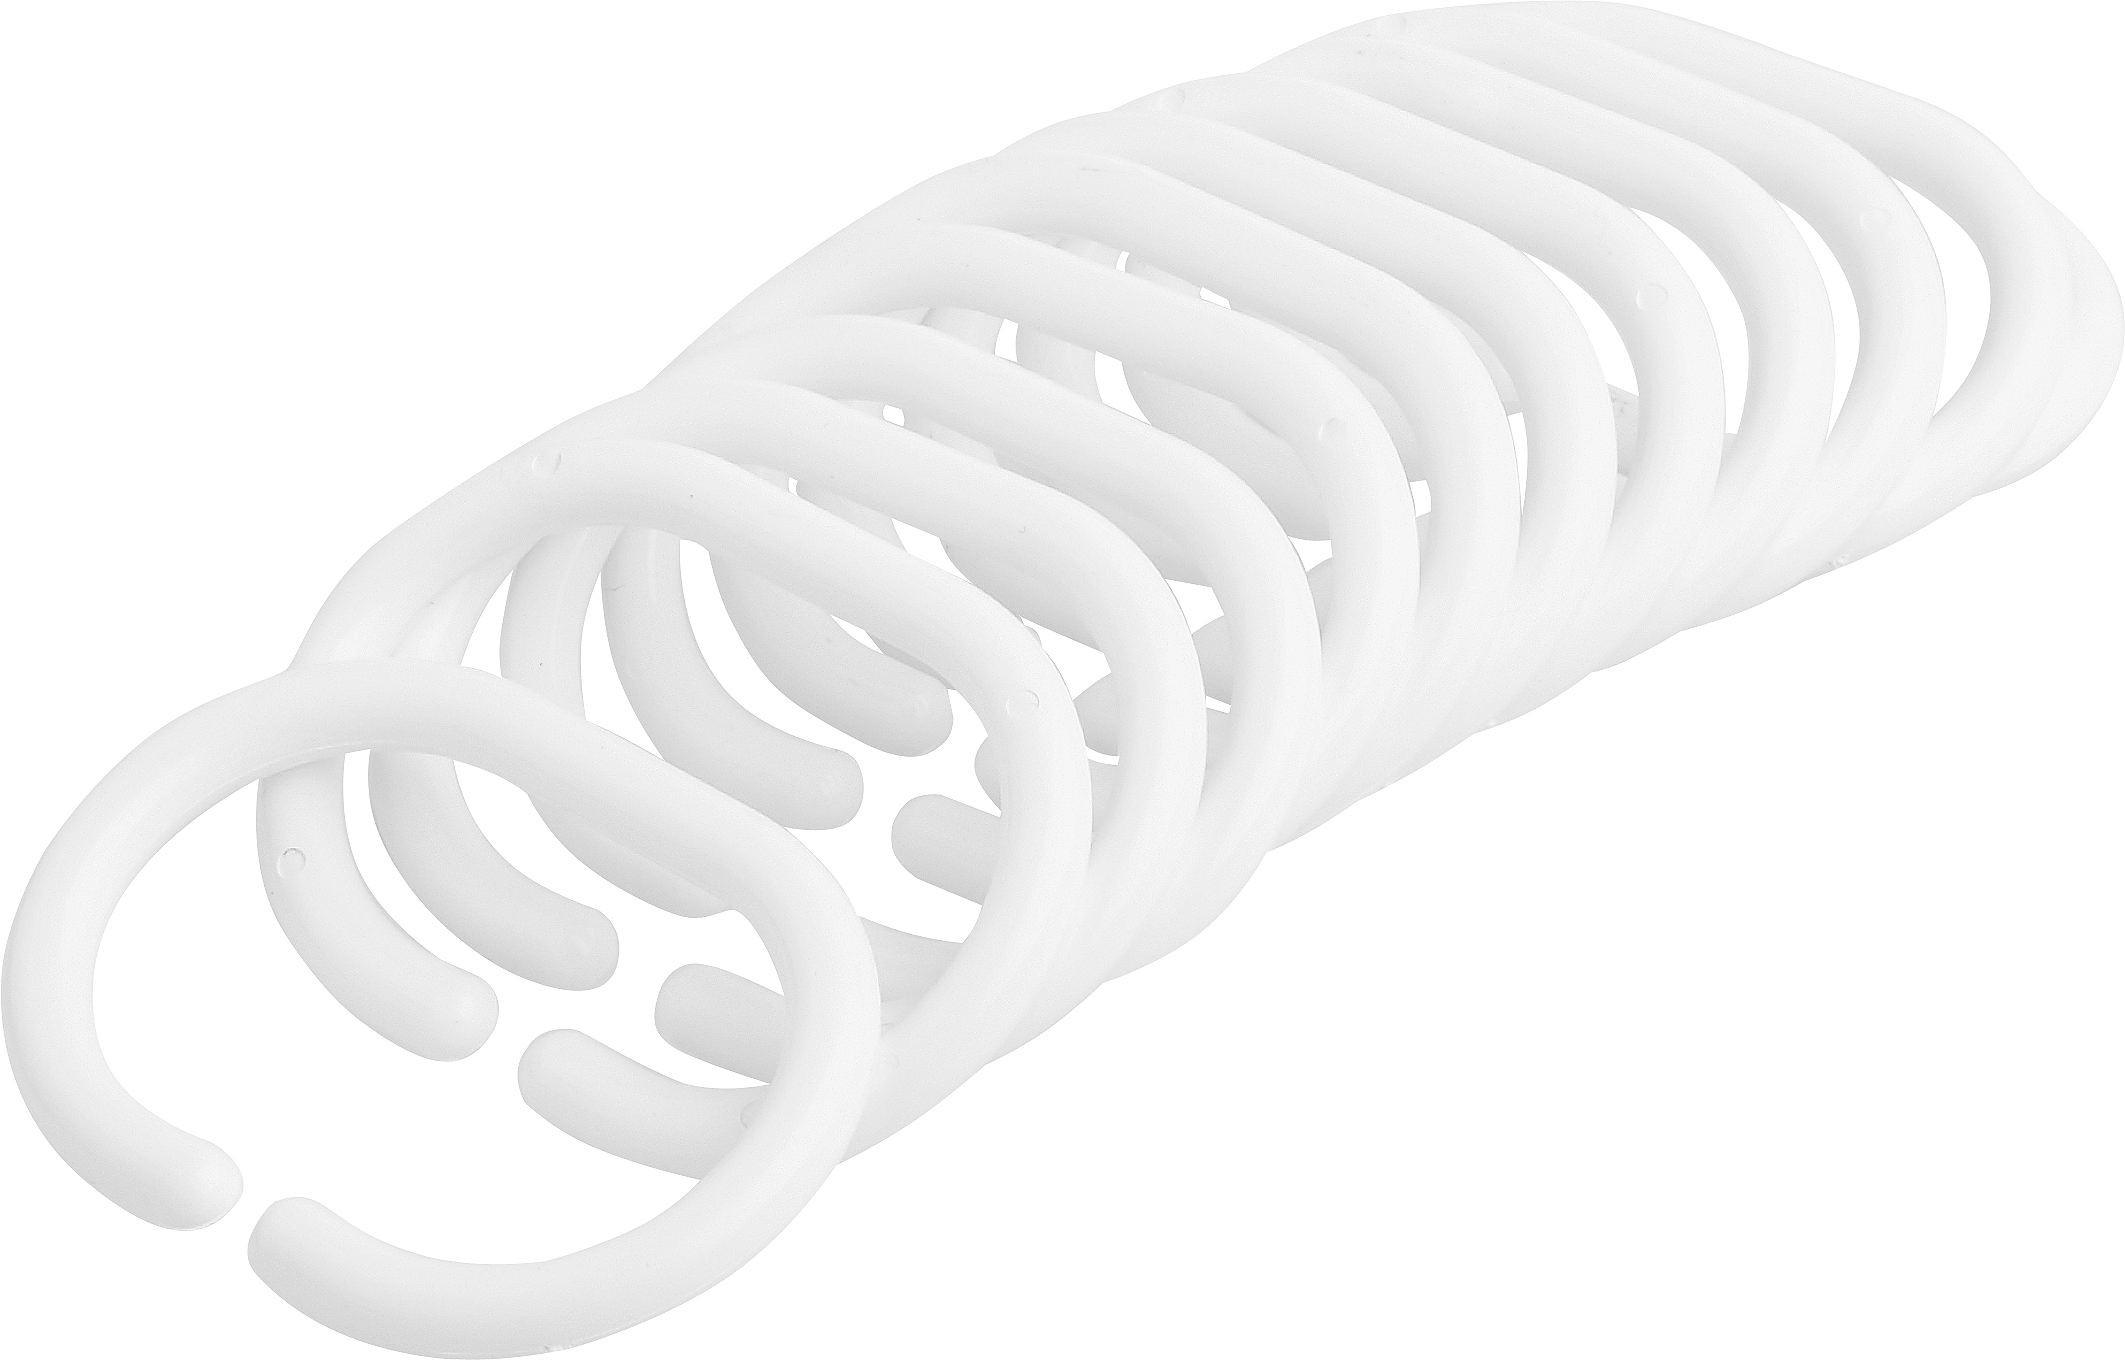 Függönykarika Zuhanyfüggönyhöz - fehér (5/6cm)